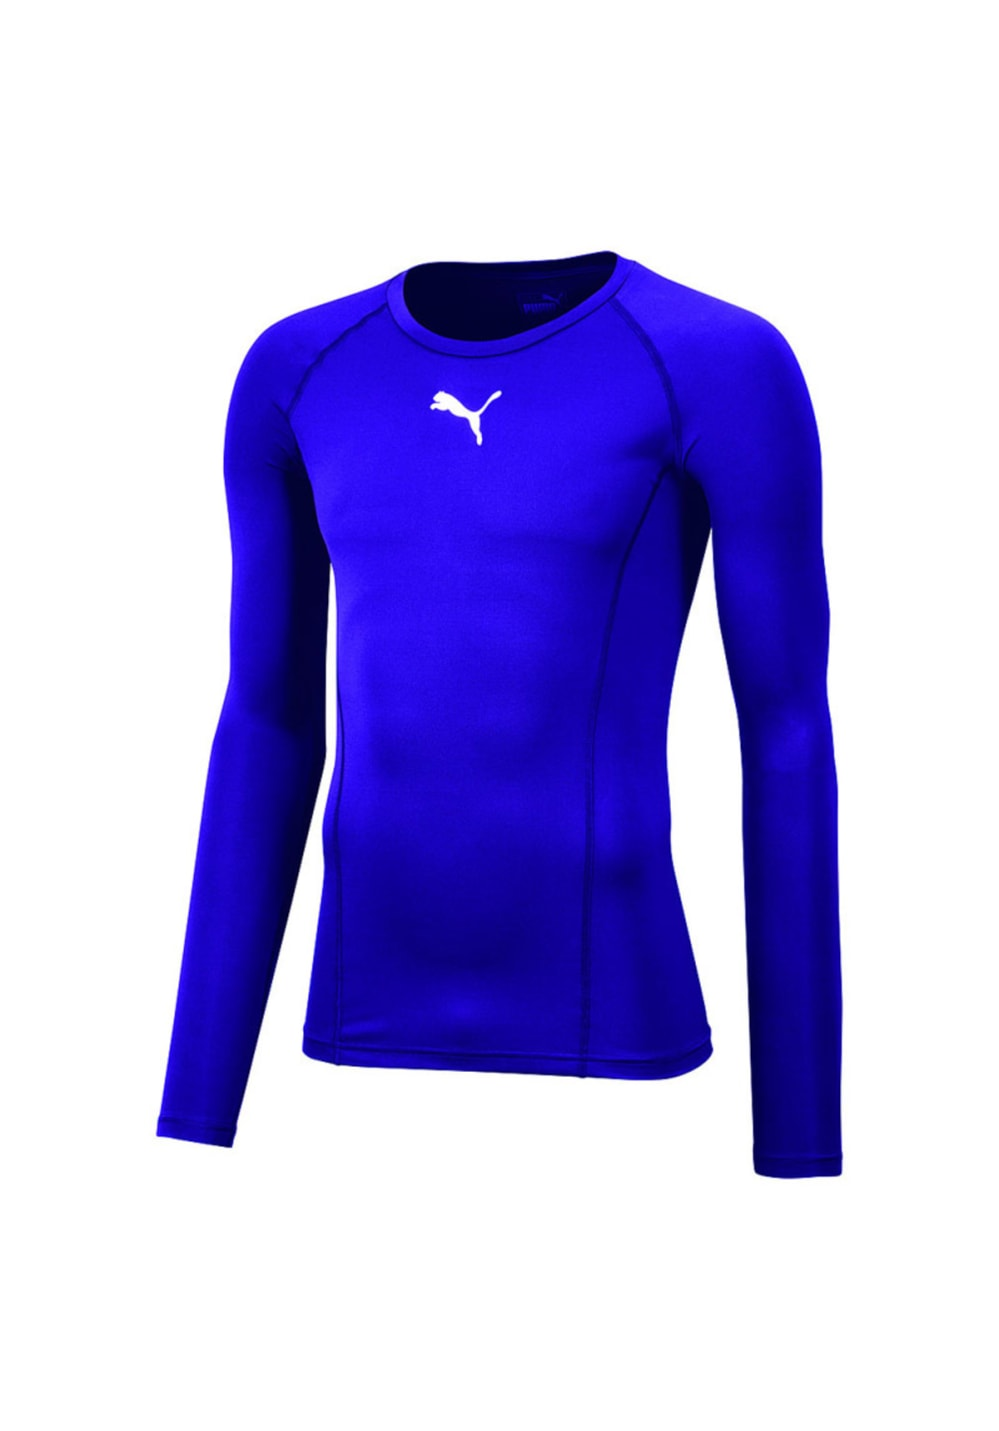 2dd84487889 Puma Liga Baselayer Tee Long Sleeve - Running tops for Men - Purple ...